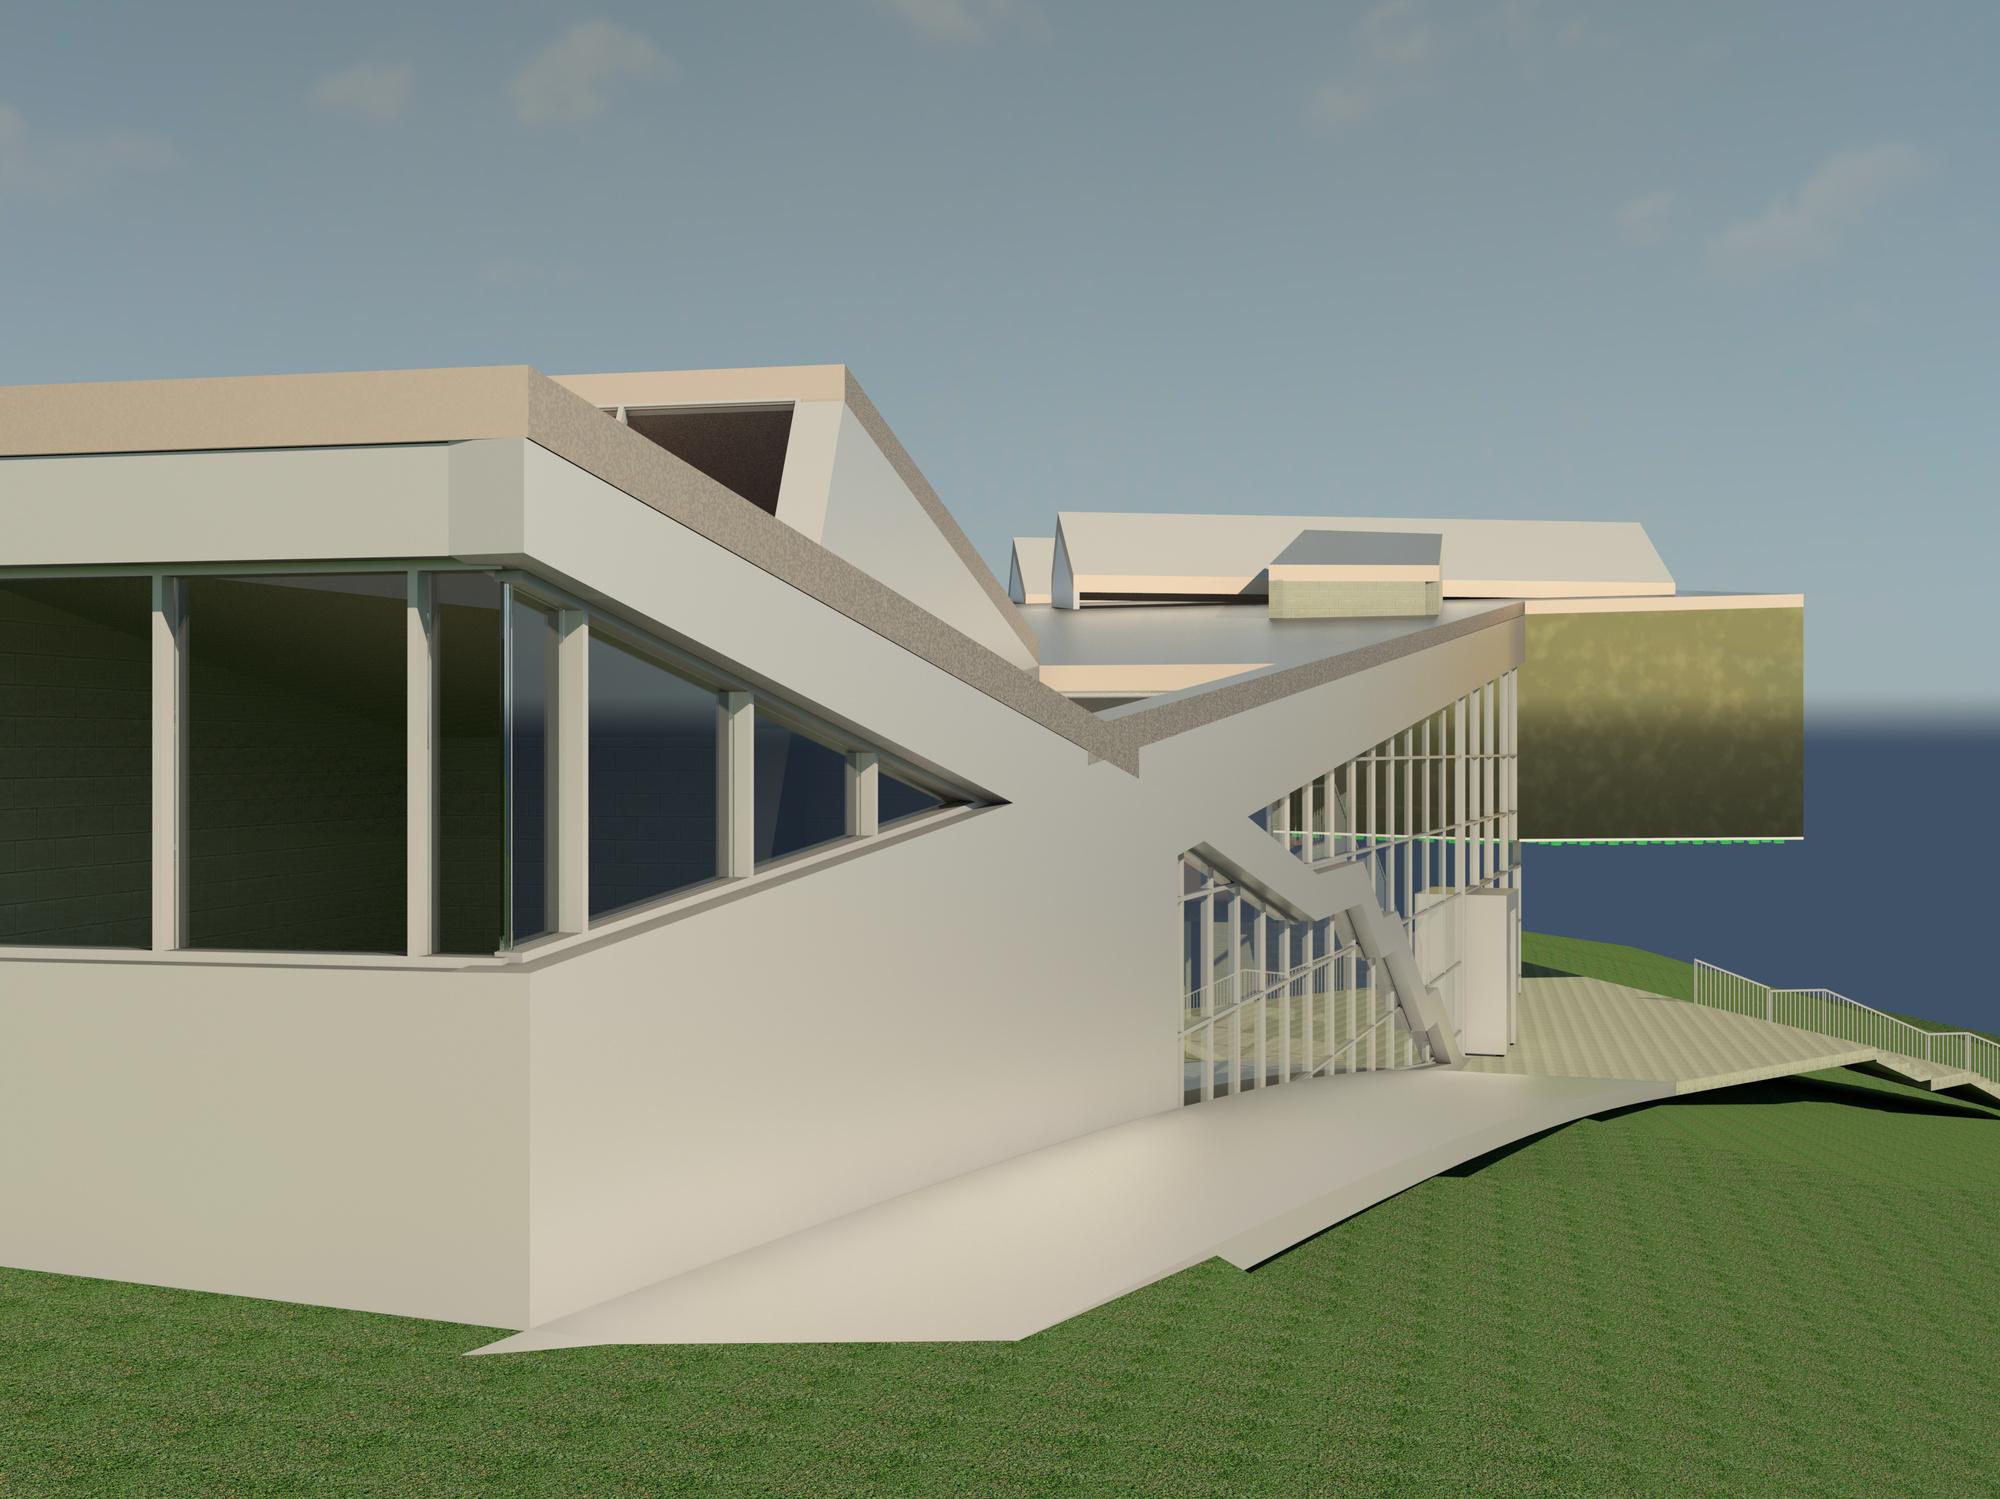 Raas-rendering20150303-10259-17za47q